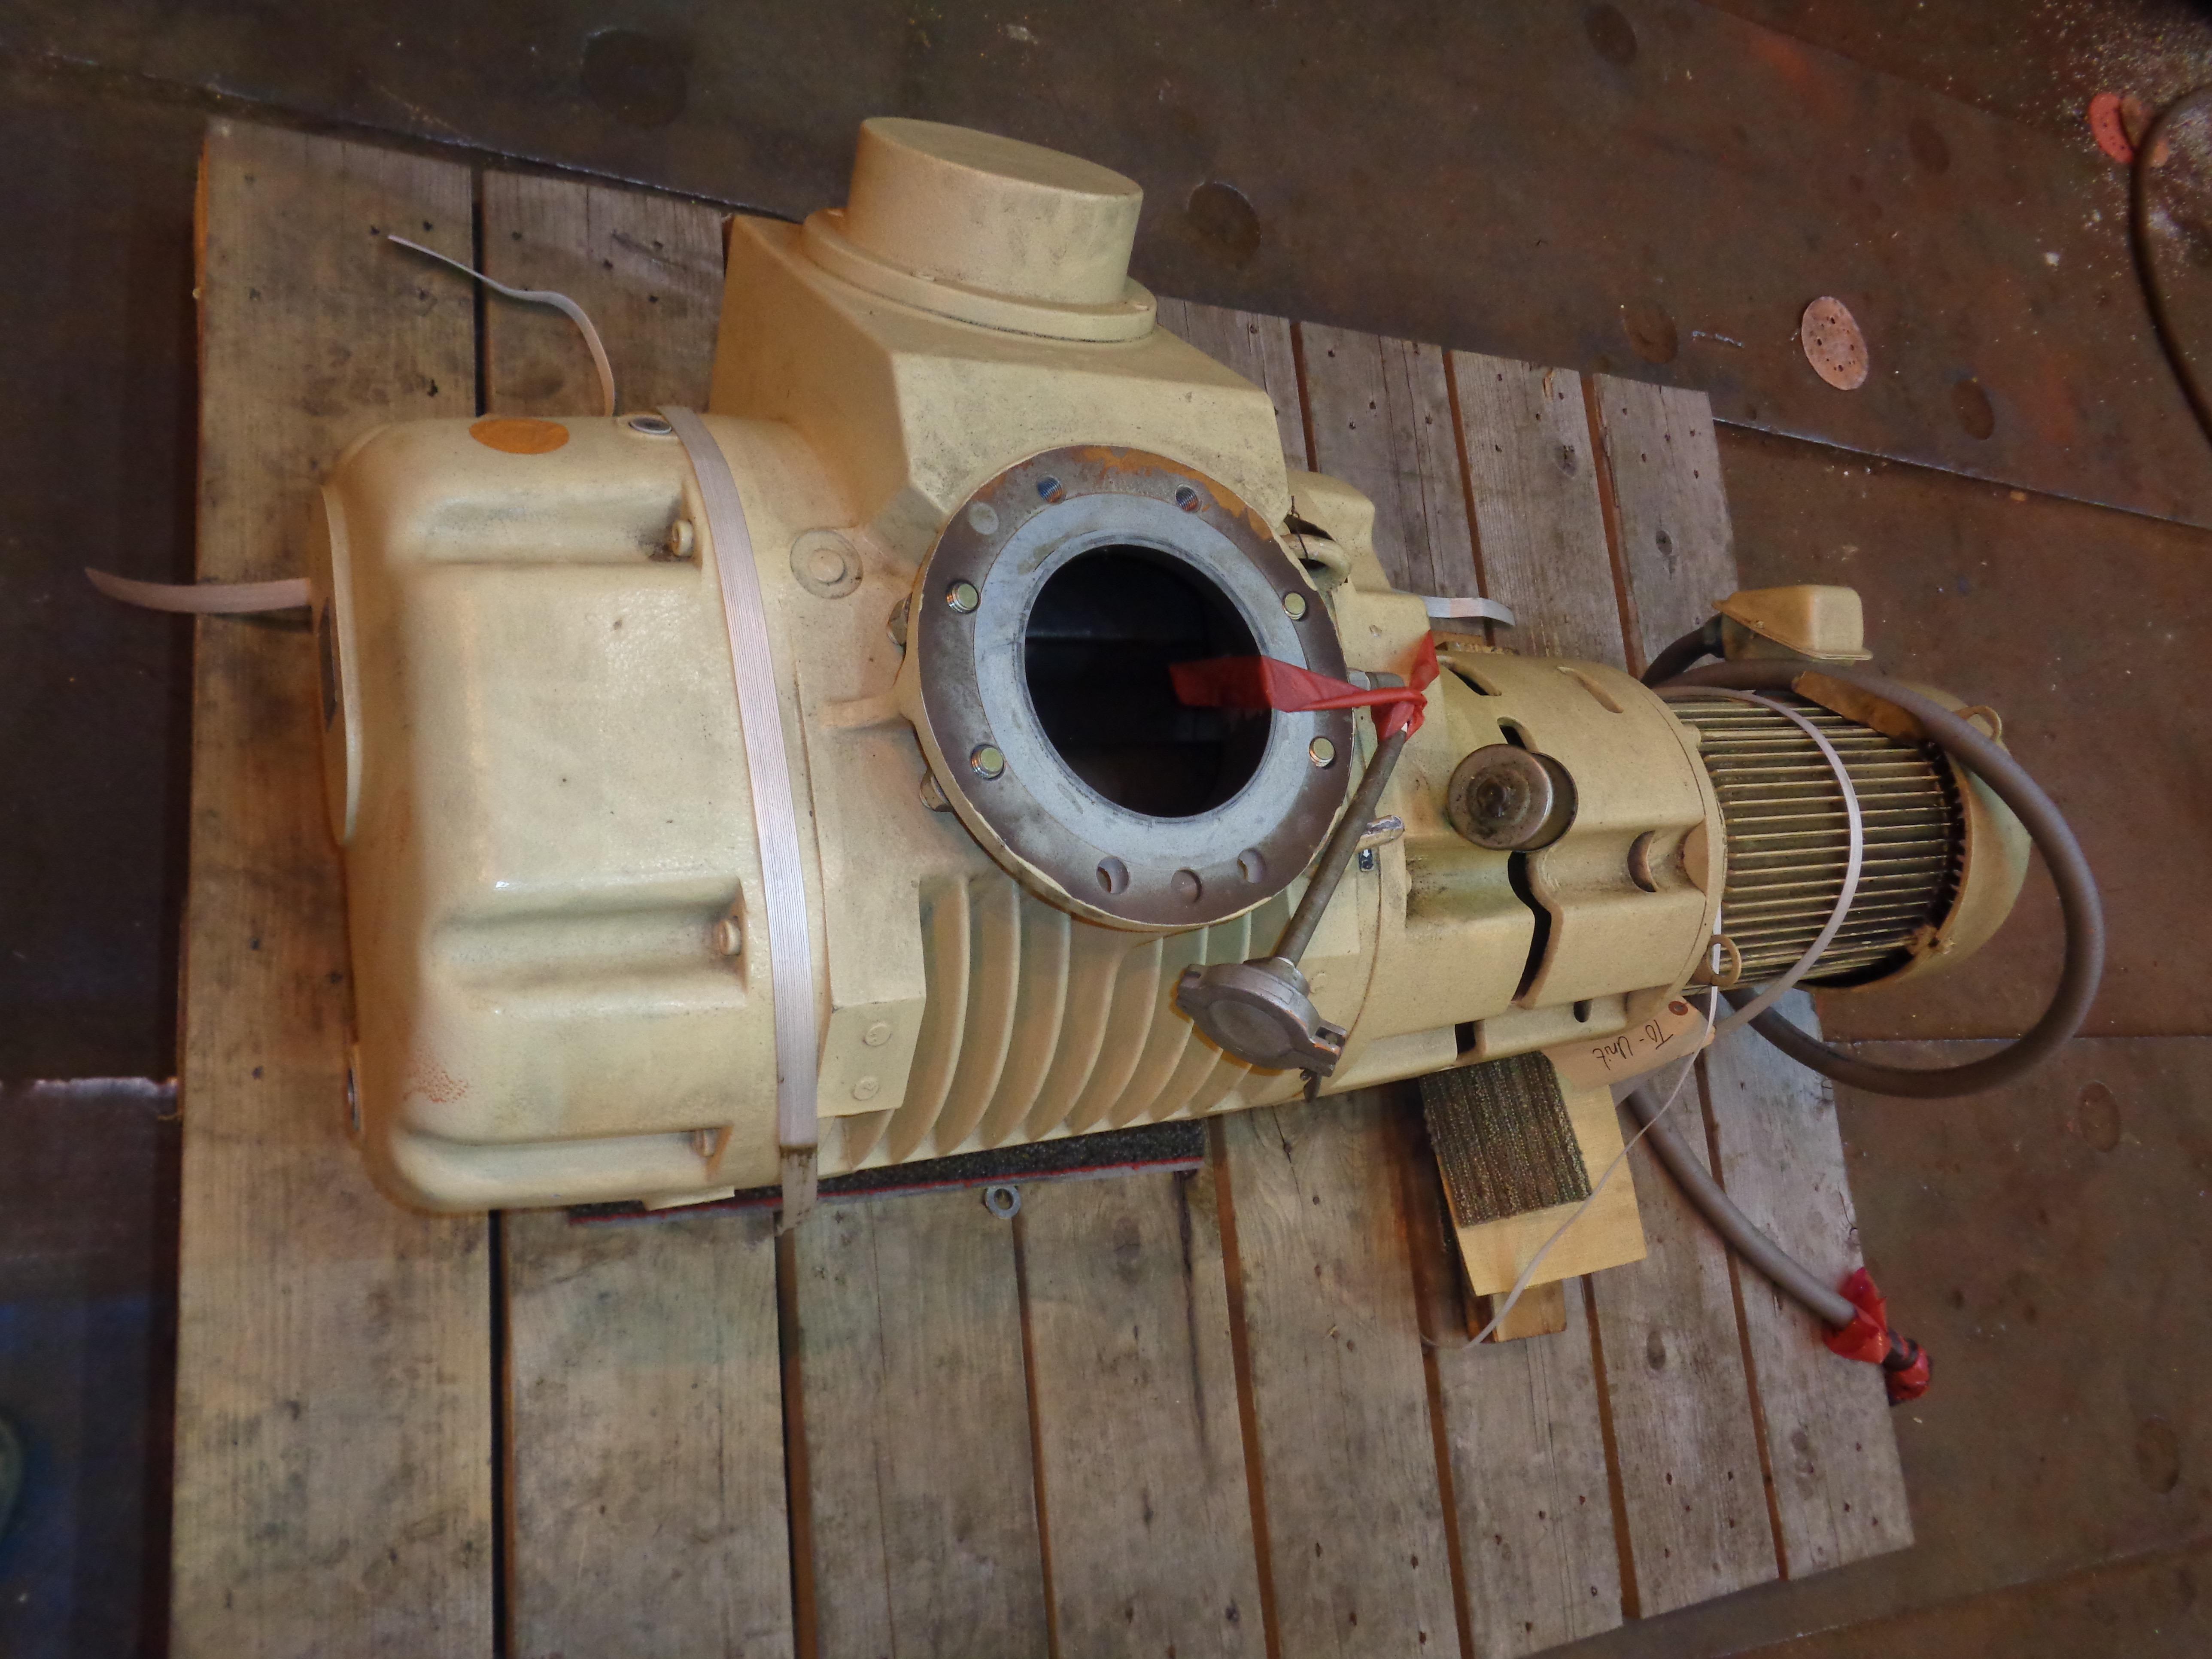 Lot of 3 Vacuum Pumps - Image 13 of 26